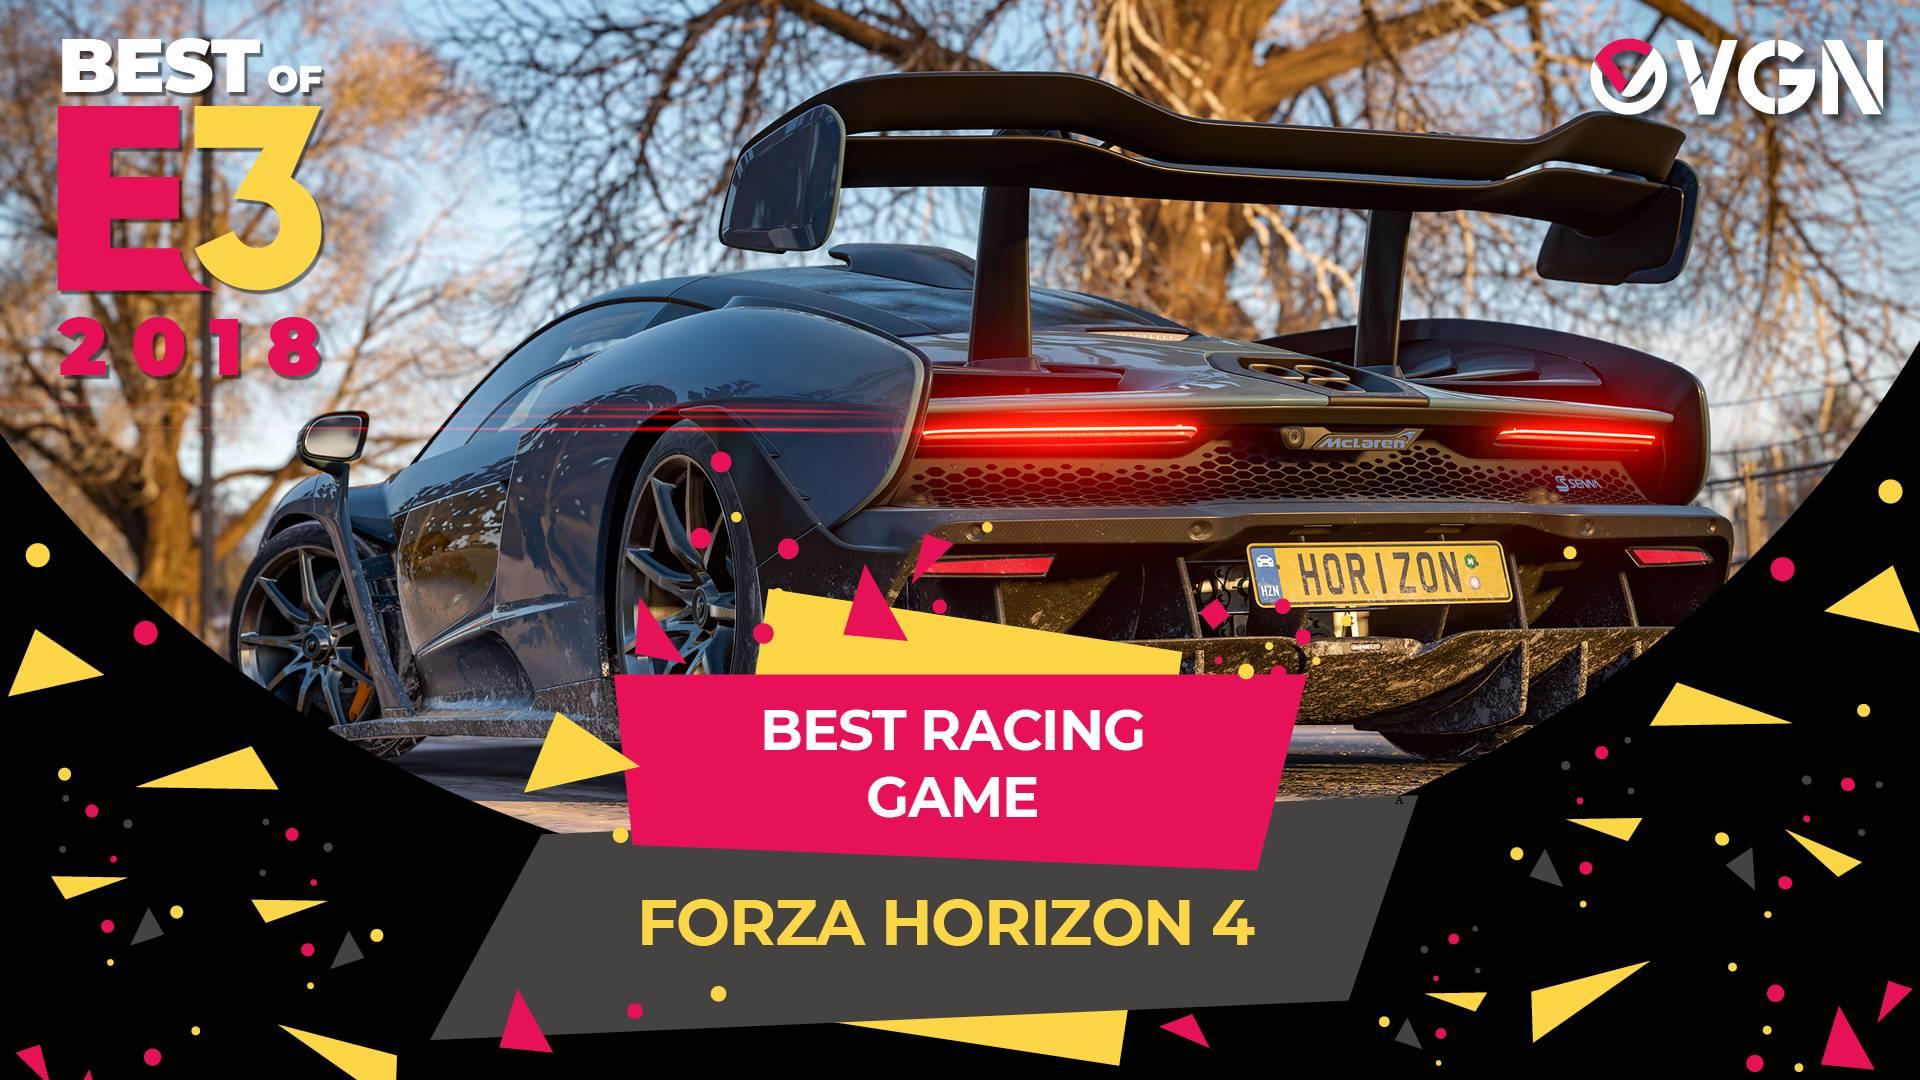 E3 2018 - Best Racing Game - Forza Horizon 4